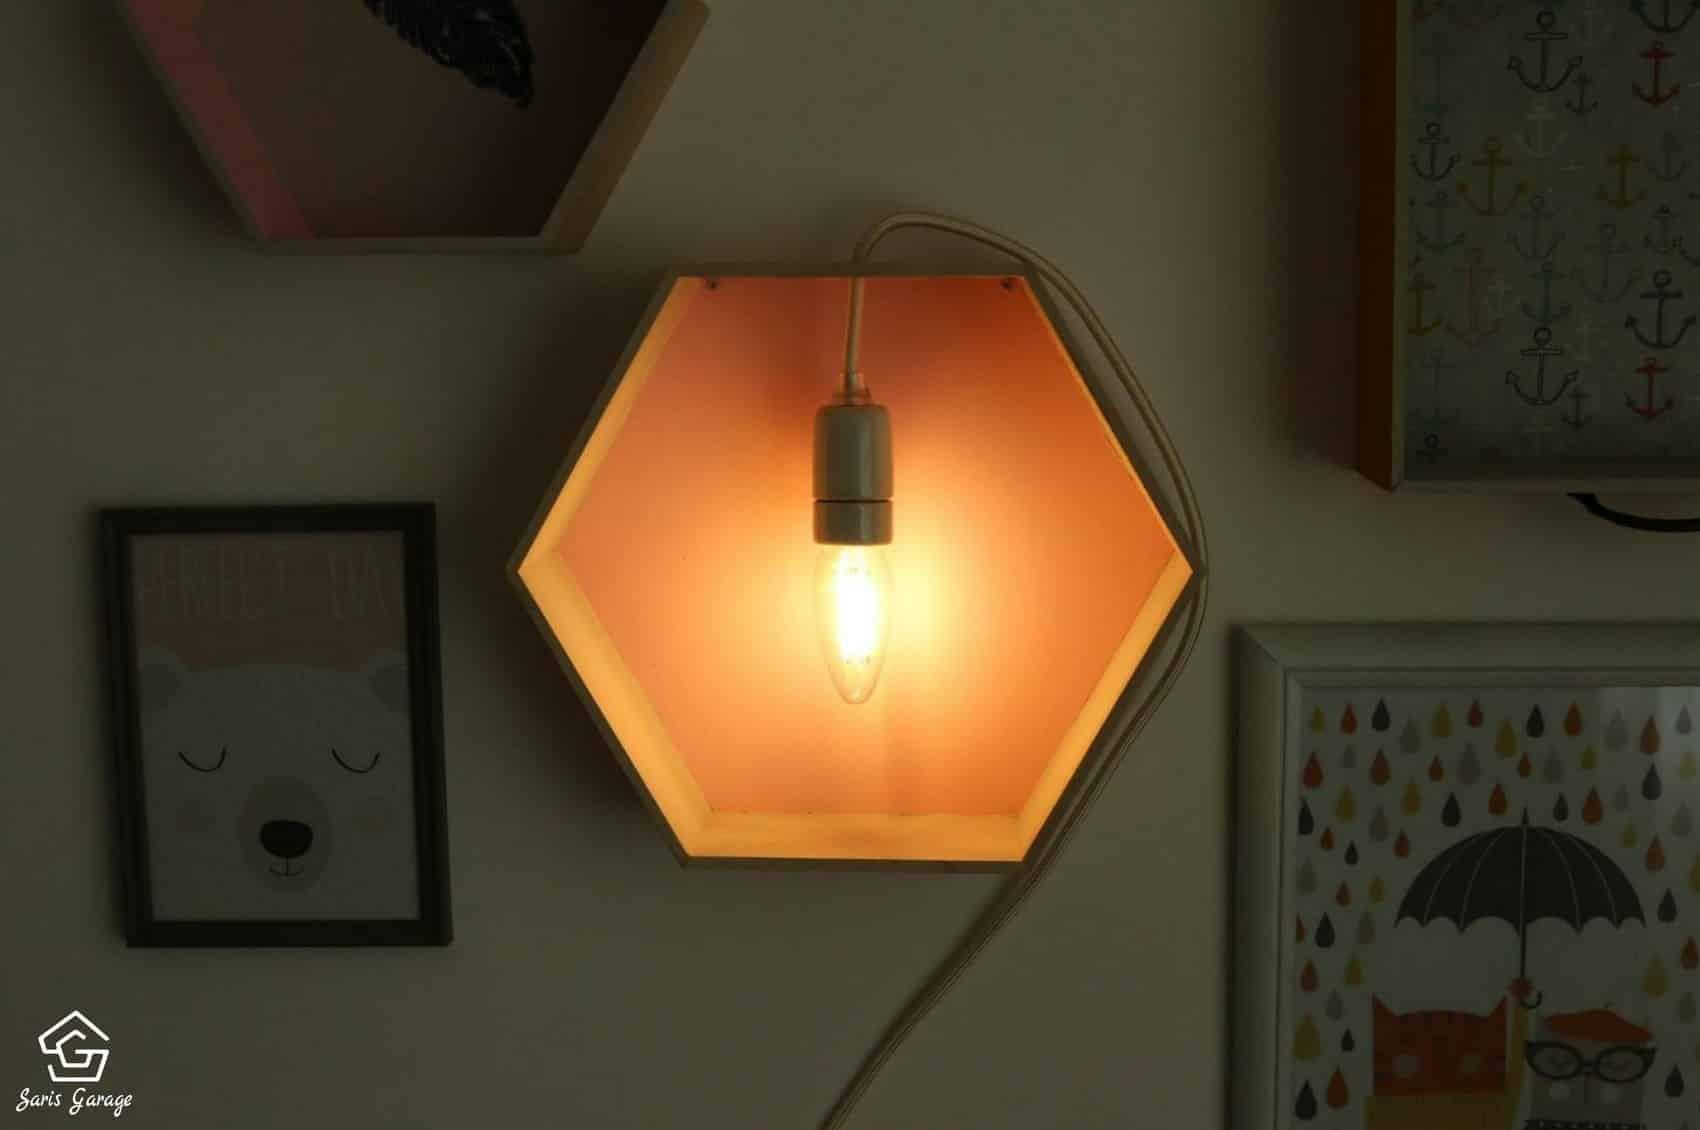 Lampe selbst bauen DIY